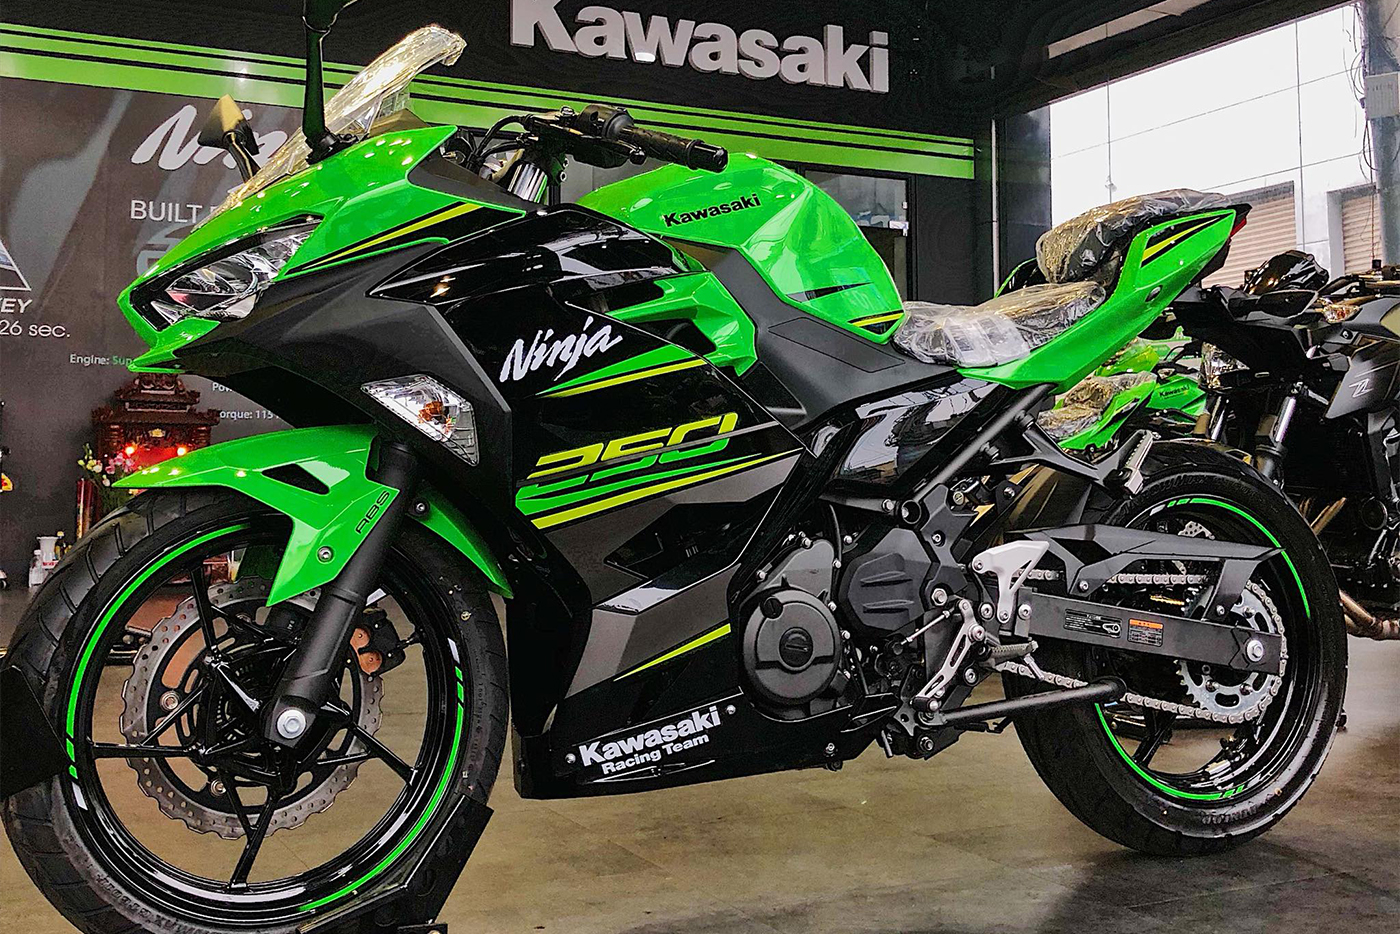 kawasaki-ninja-250-2018-8.jpg